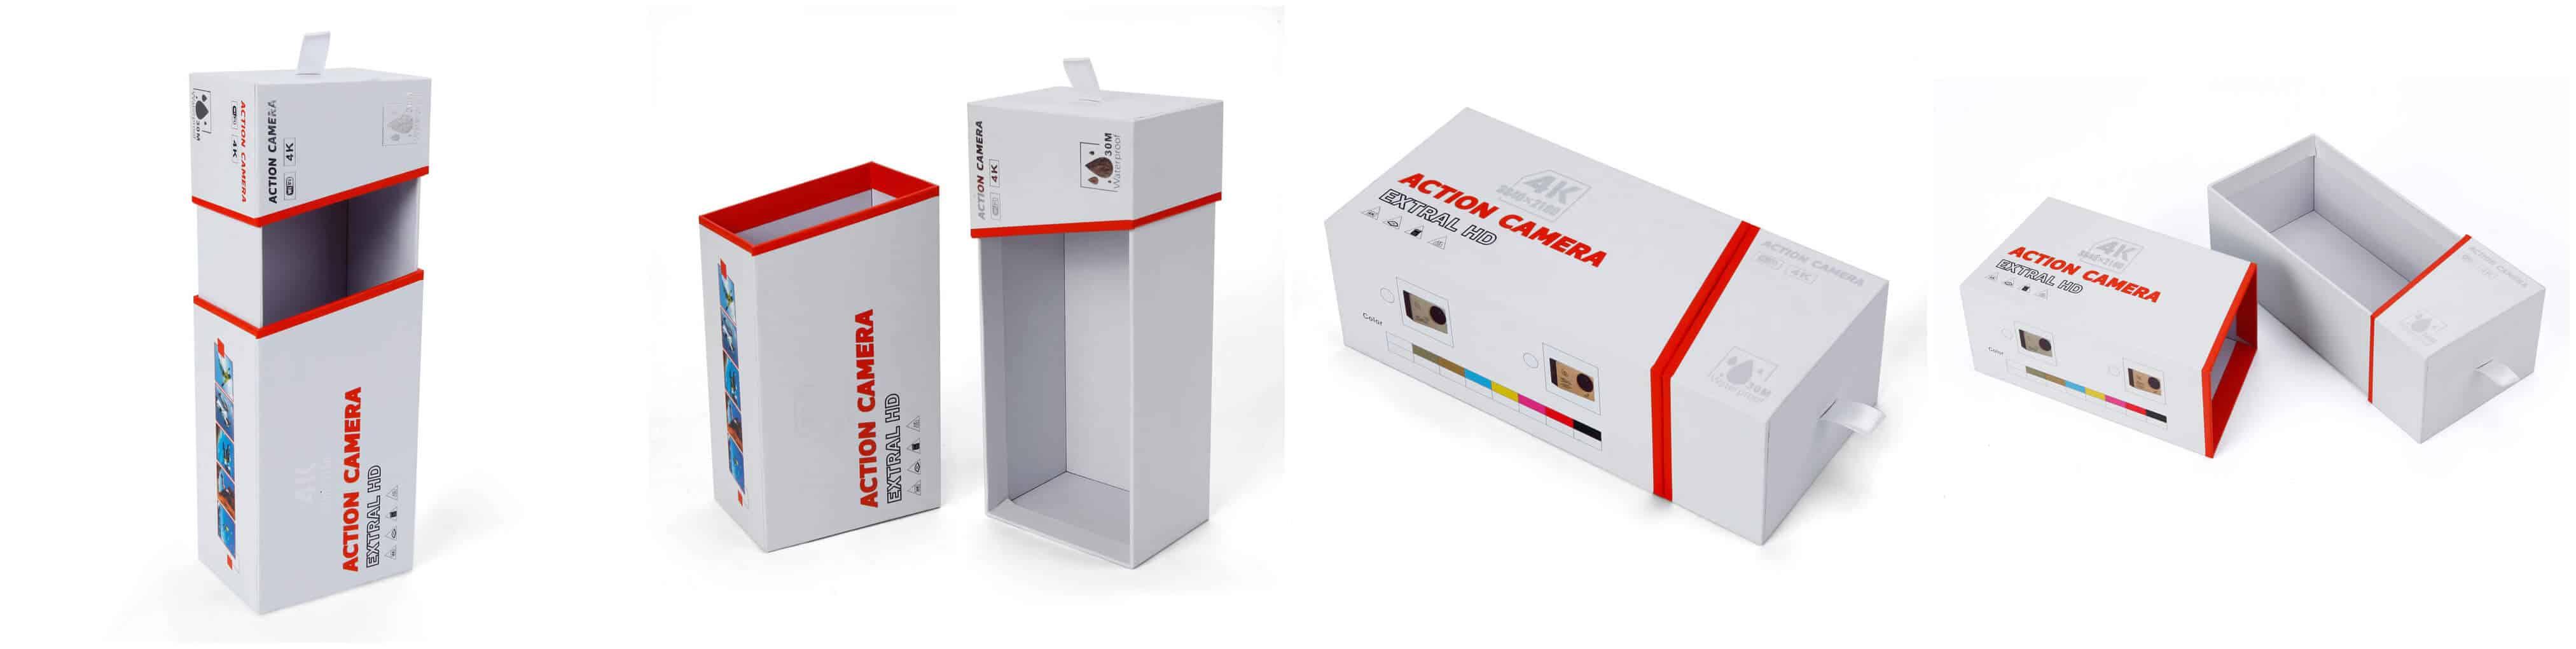 Custom-Rigid-Box-for-Action-Camera-b